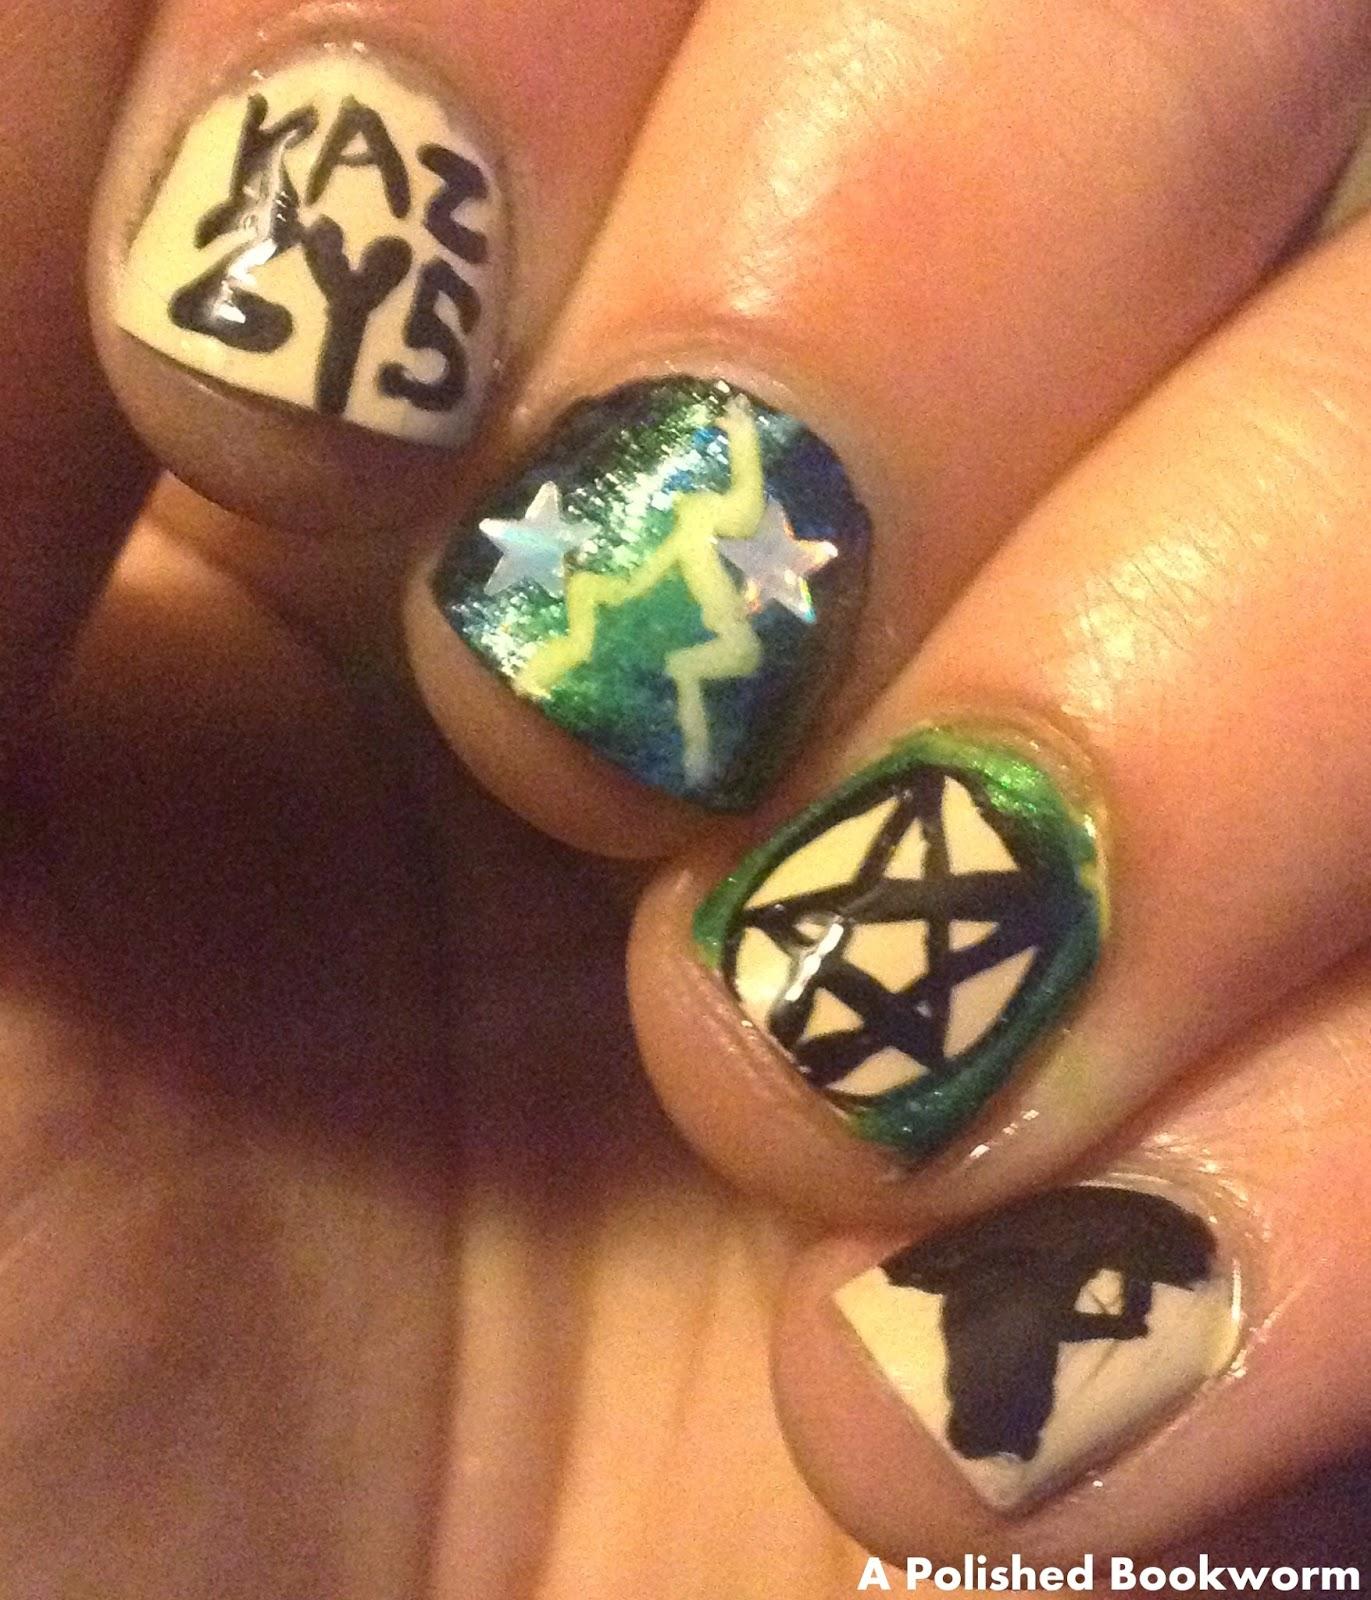 Supernatural (The TV Show) Inspired Nail Art